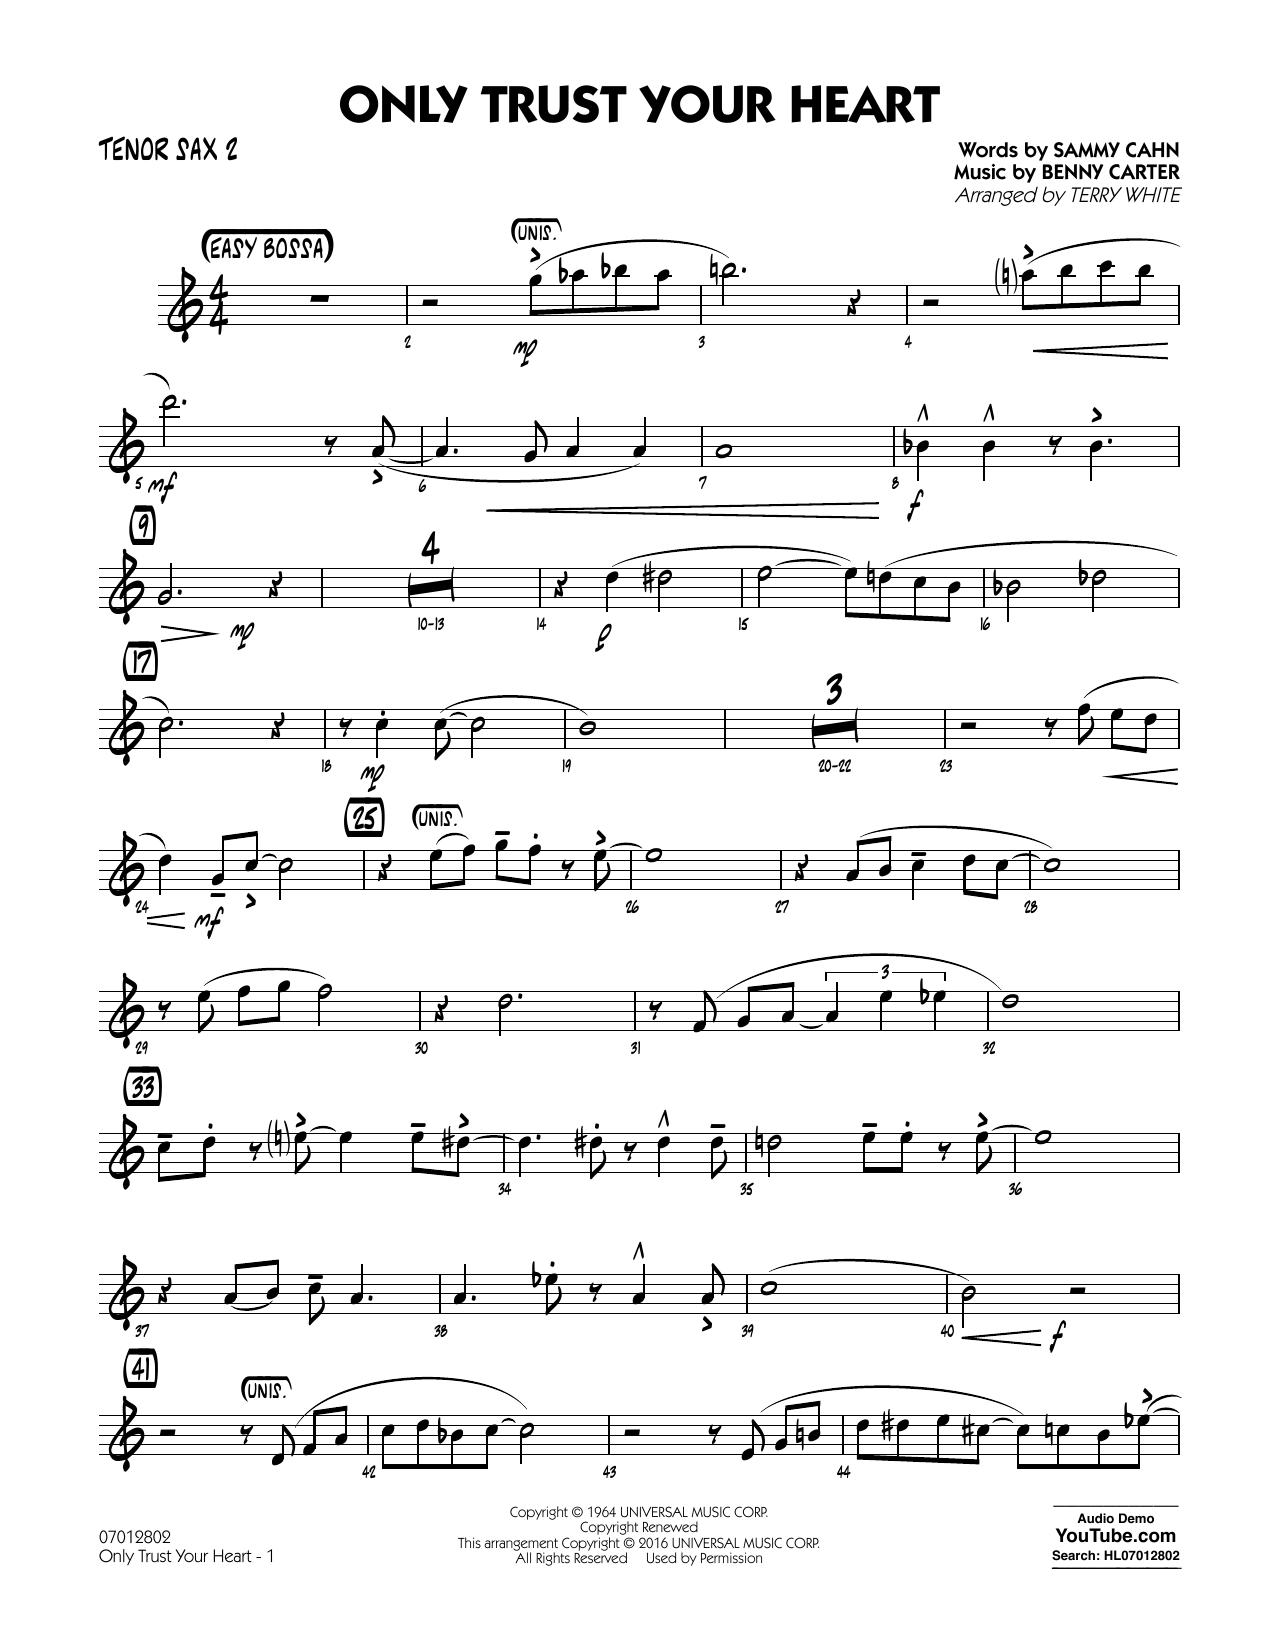 Sammy Cahn - Only Trust Your Heart - Tenor Sax 2